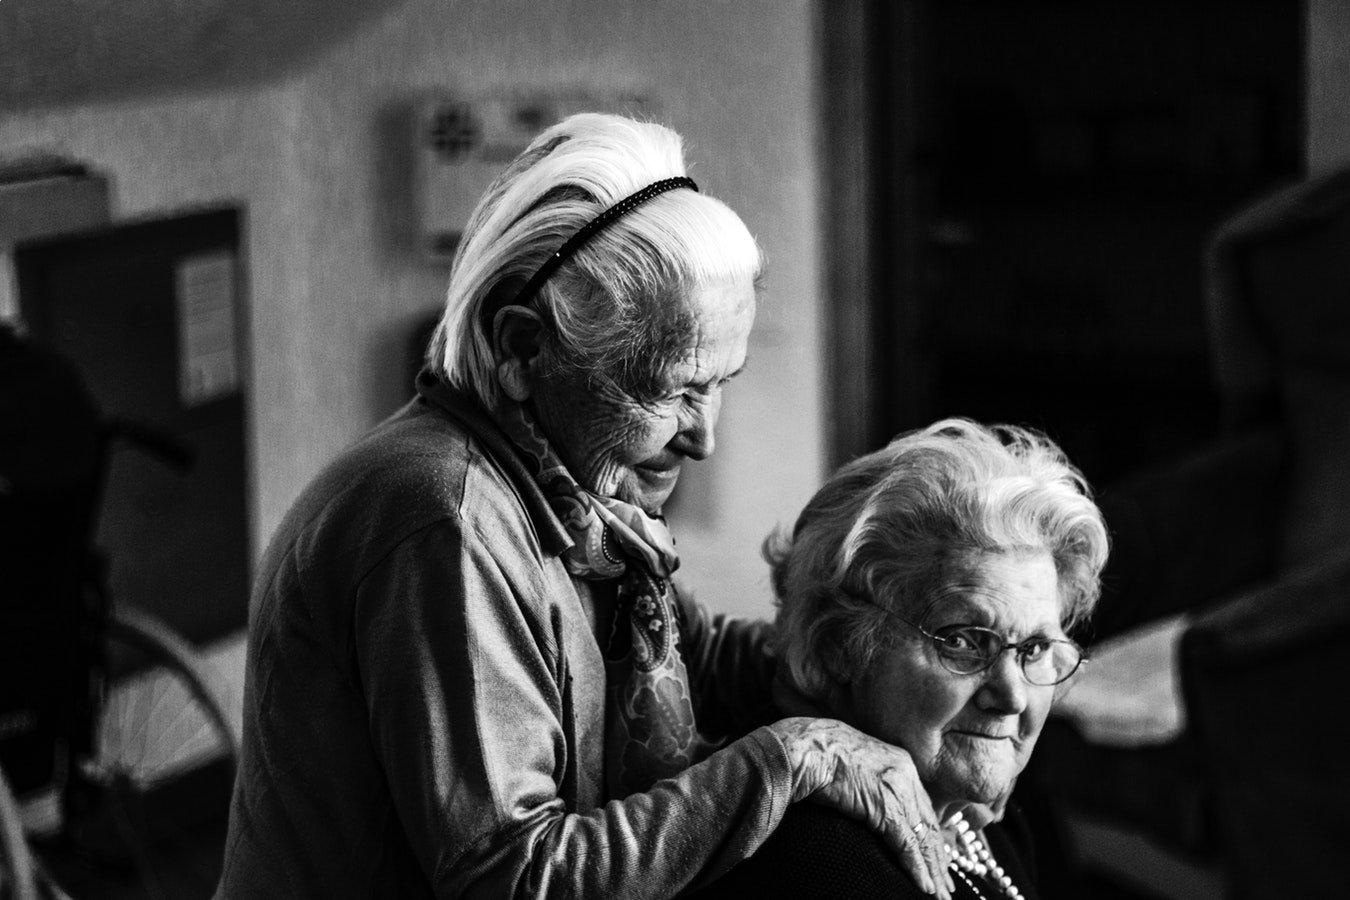 An elderly woman comforting her friend. Seniors with alzheimers often get dementia treatment